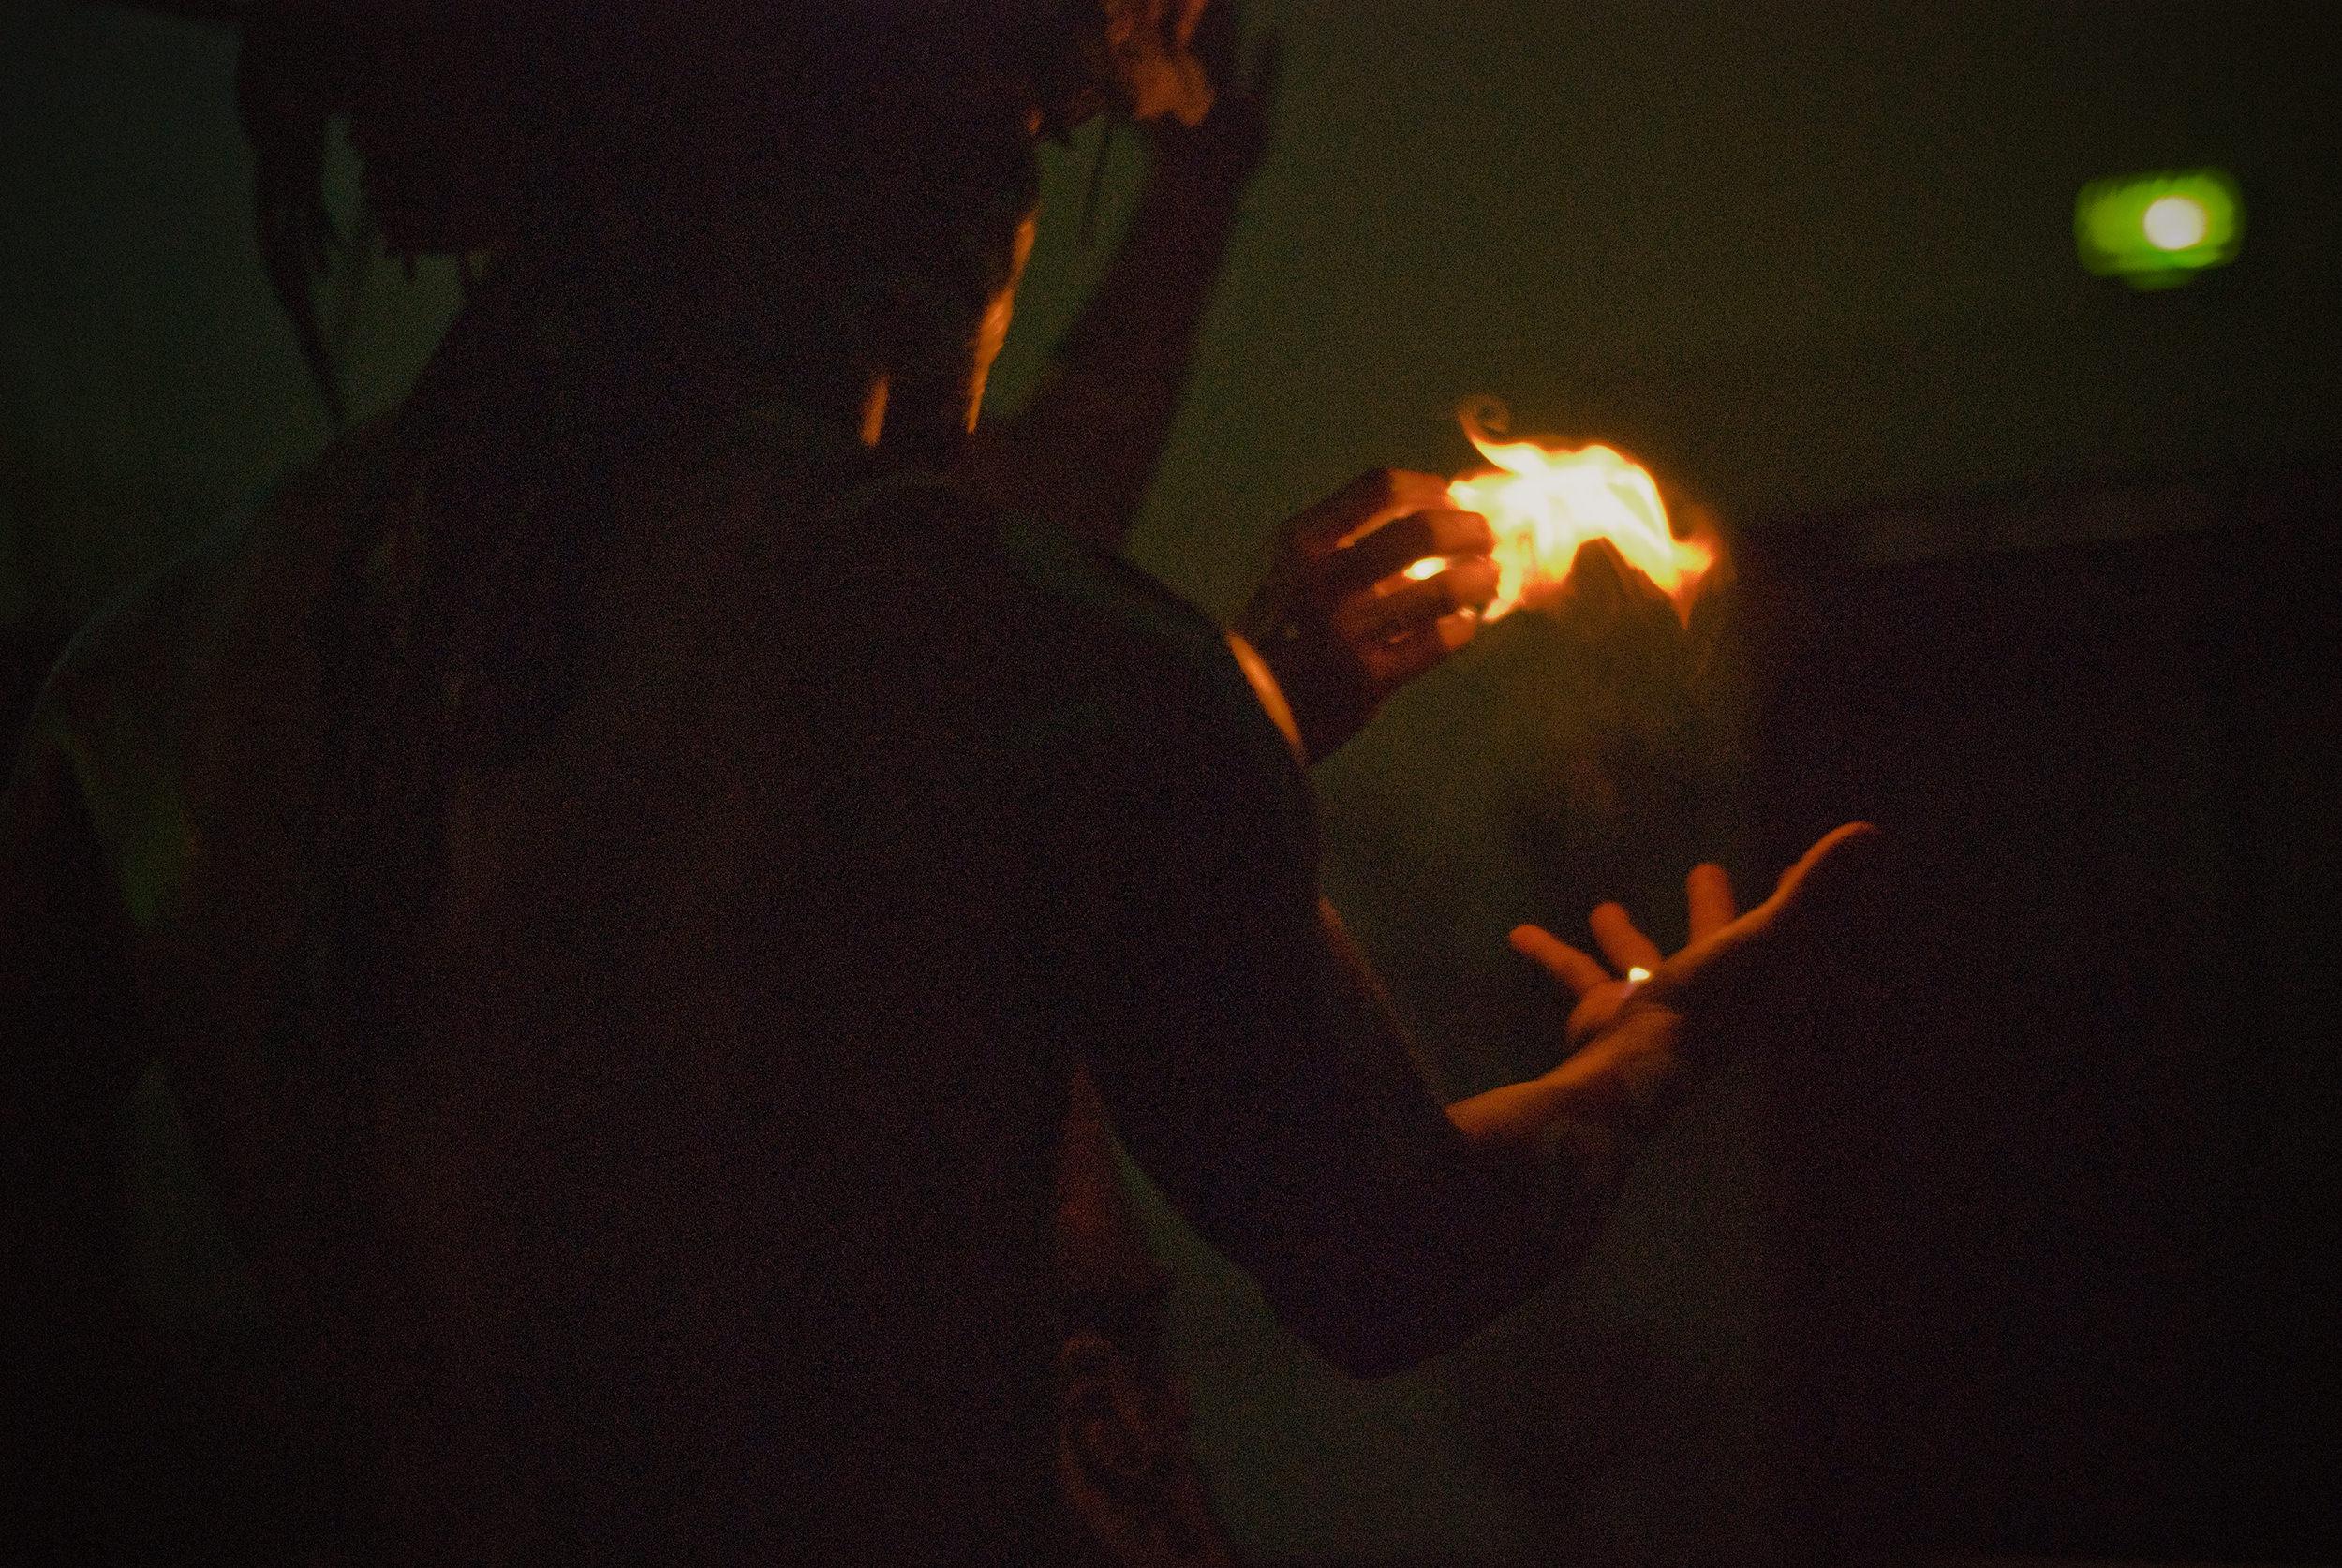 wojtek-jakubiec-photographer-montreal-mayan-mexico-documentary-Mayan-show-fire-ritual-back.jpg